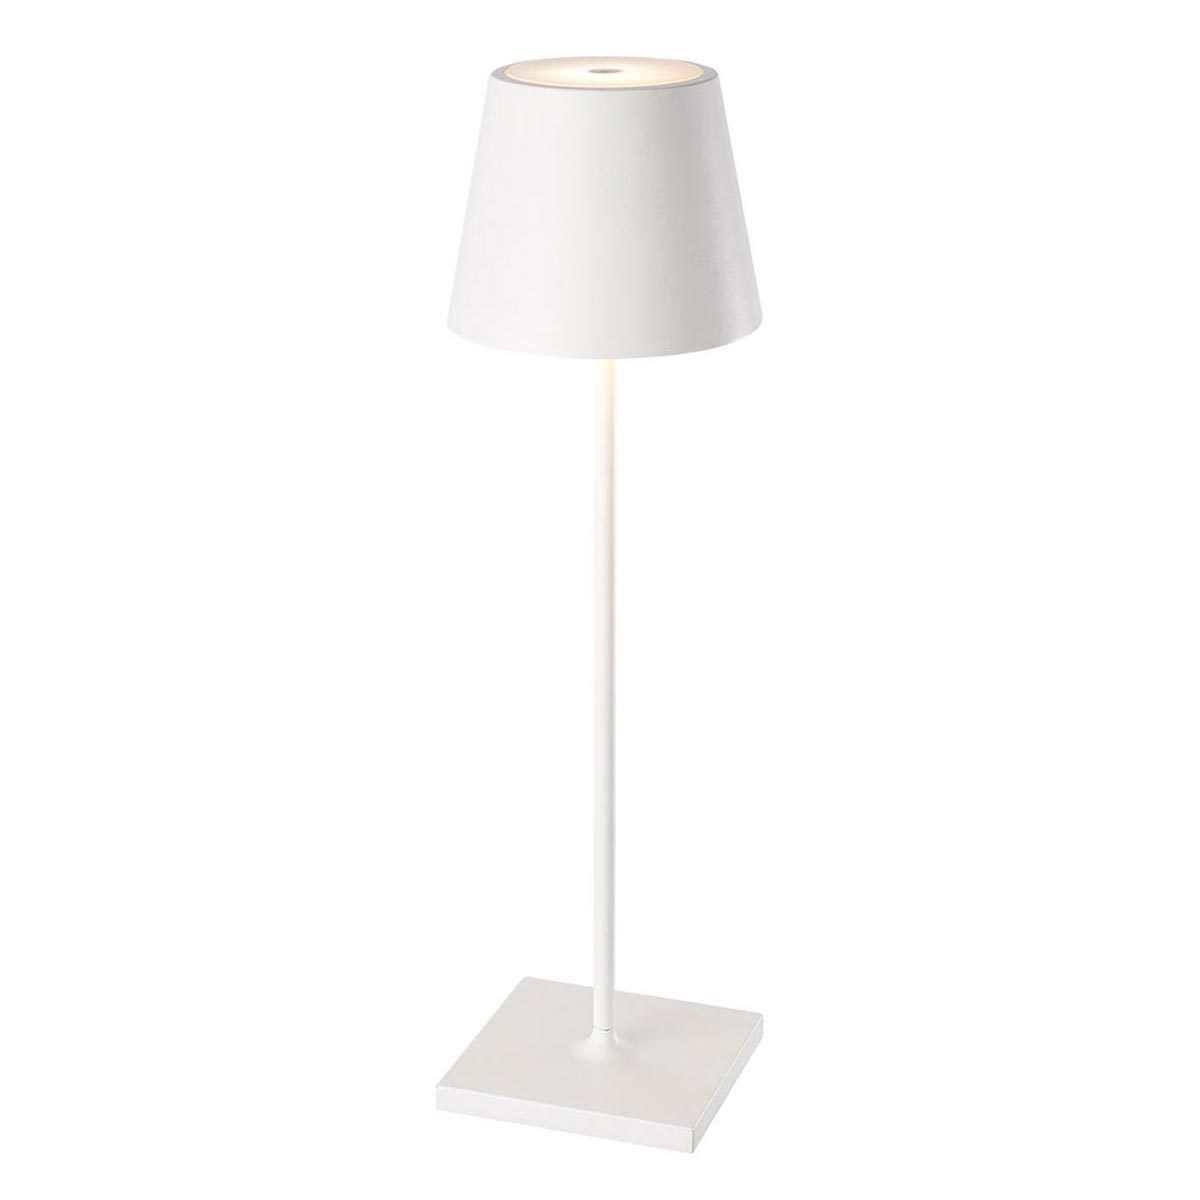 KELLY - Lampe de table sans fil aluminium blanc 39cm